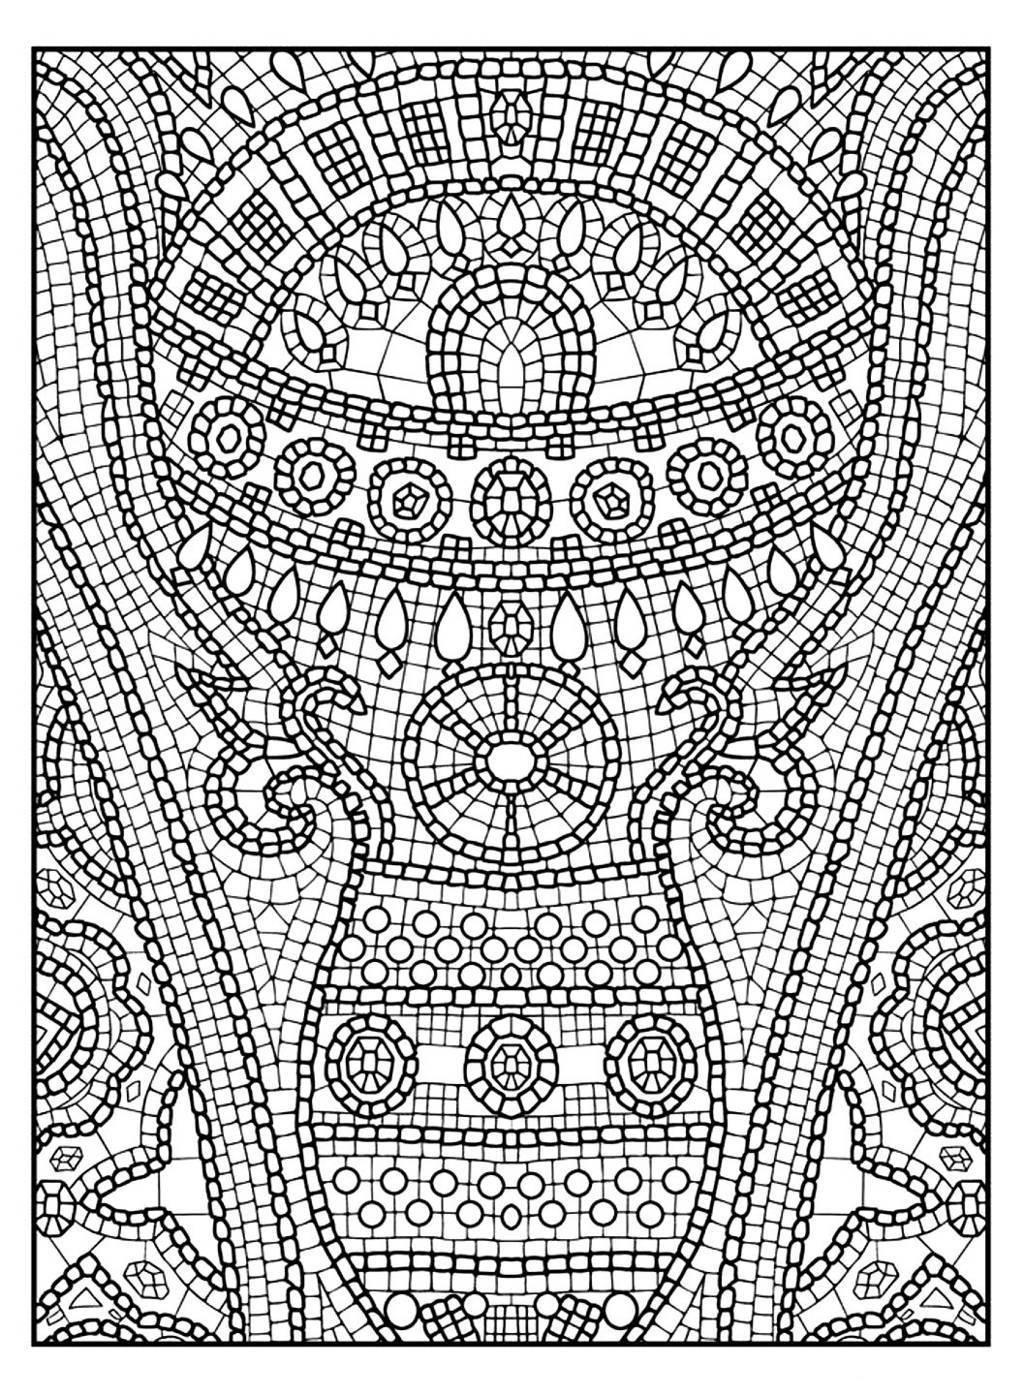 Mosaic Patterns Coloring Page